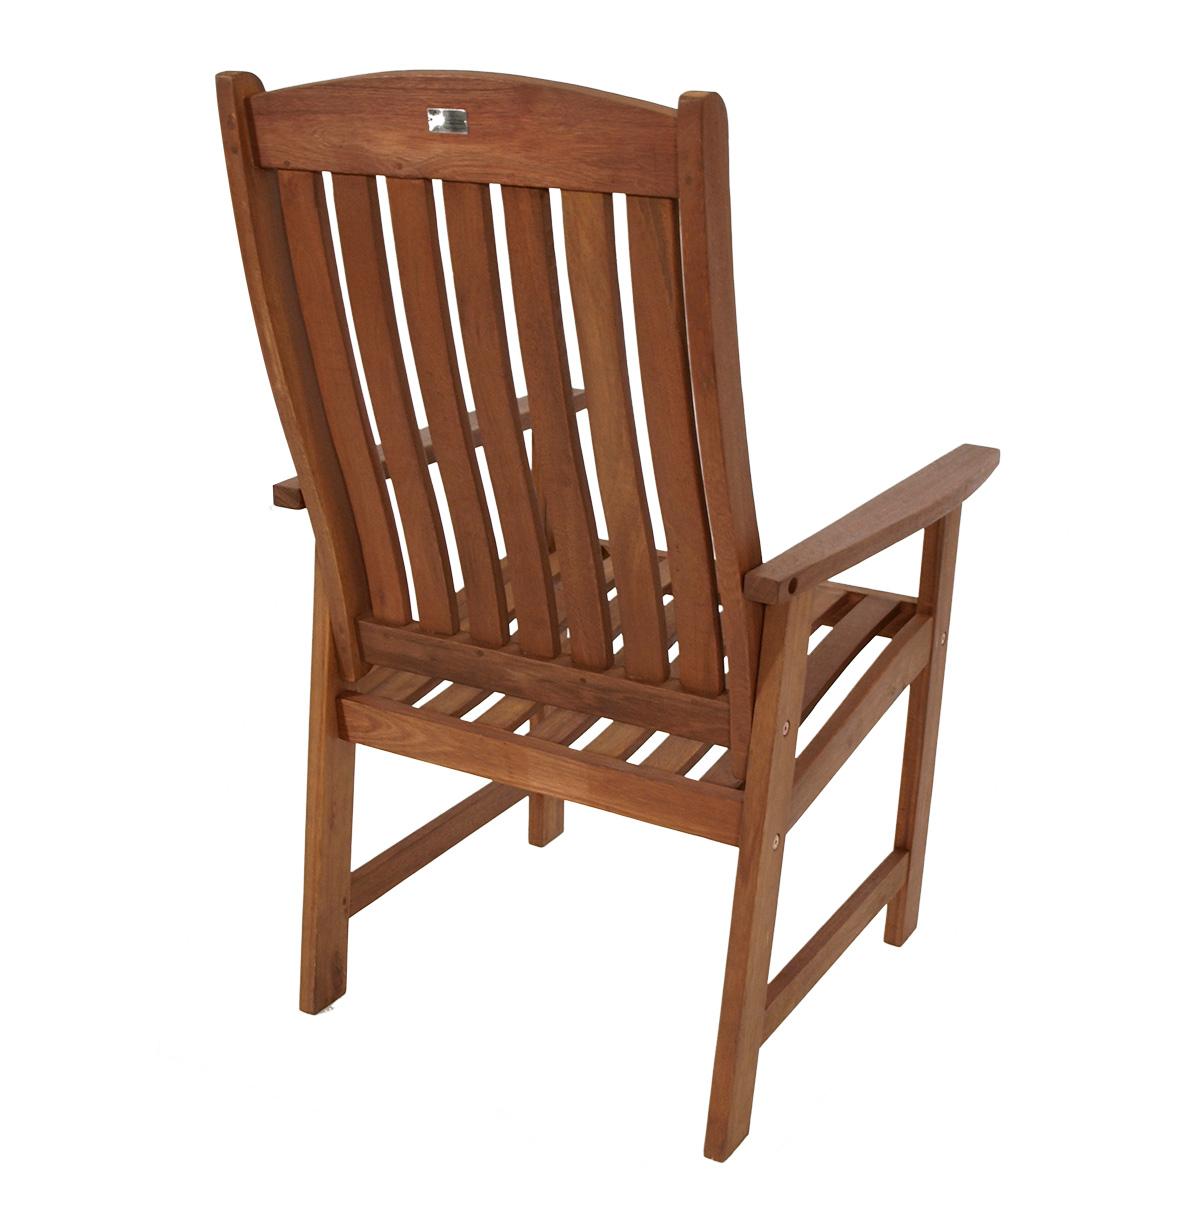 hochlehner sessel gartenstuhl hochlehnersessel dakar eukalyptus fsc zert ebay. Black Bedroom Furniture Sets. Home Design Ideas